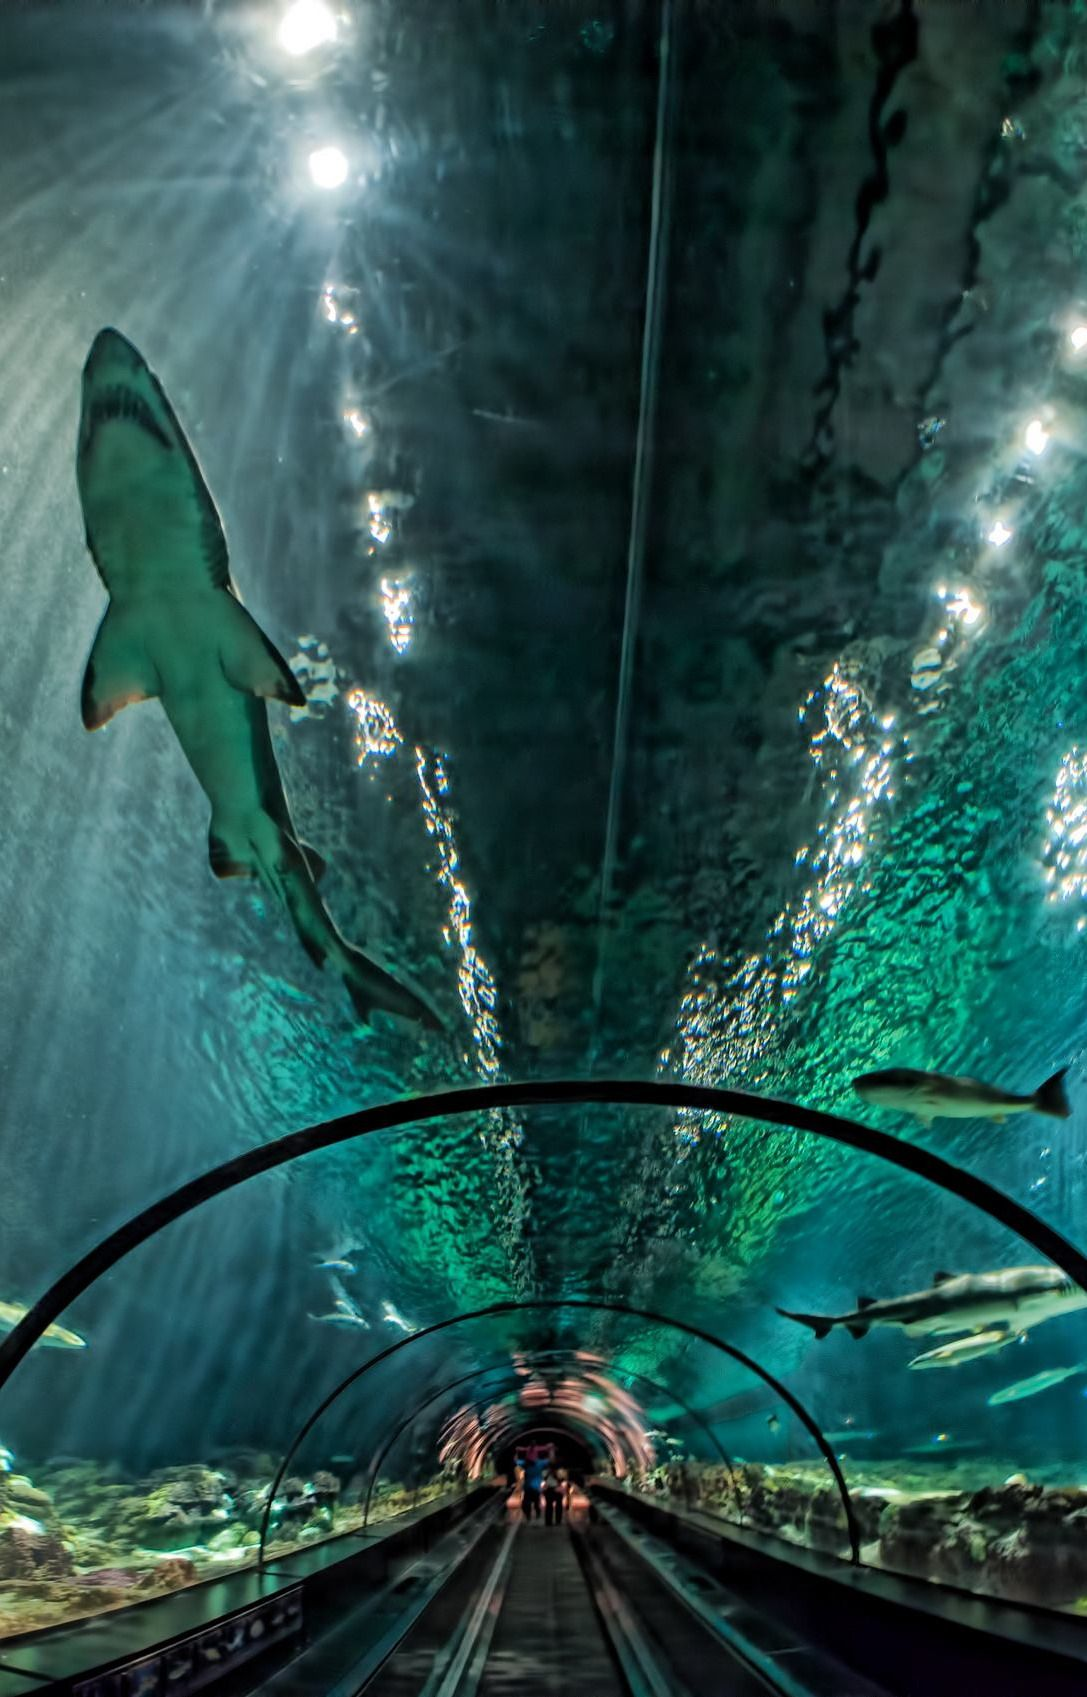 Glass Tunnel Through The Shark Exhibit at Sea World, Orlando, Florida